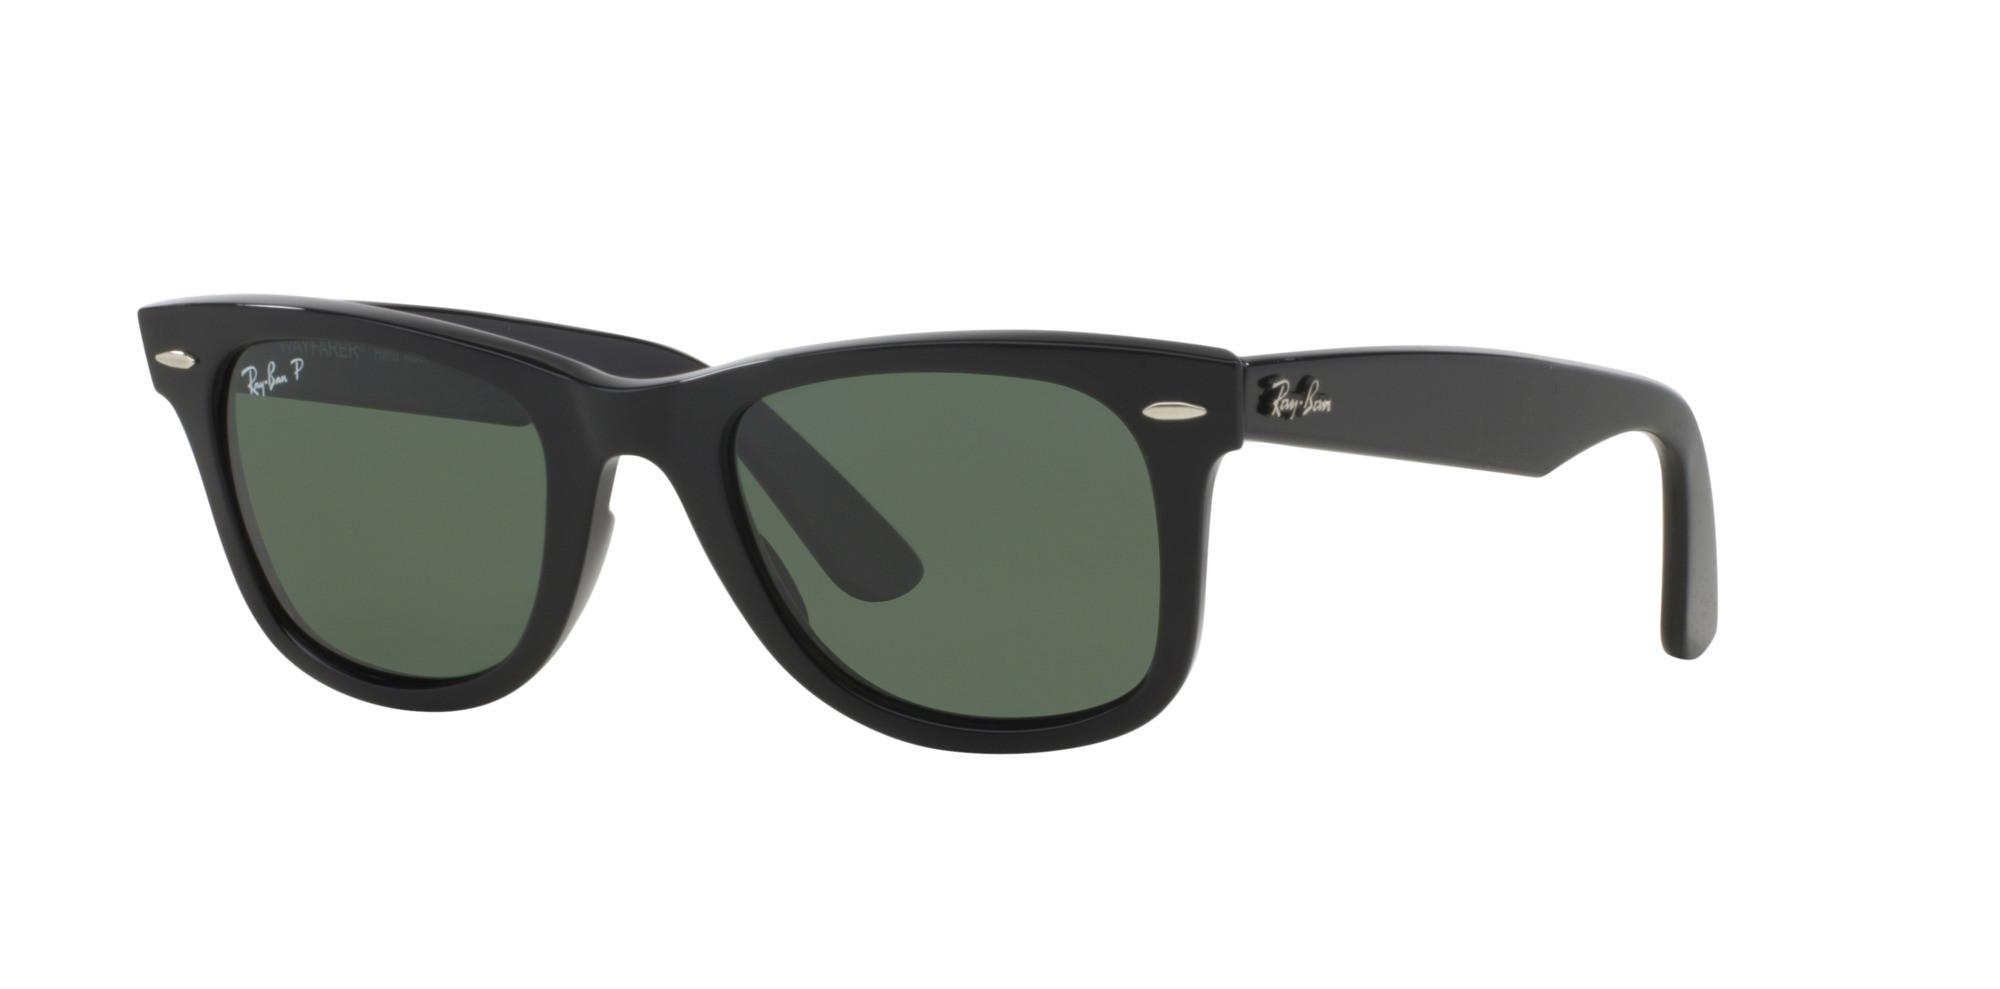 f3d2f16171 Ray-Ban RB 2140 901/58 Wayfarer Polarizadass 54 Negras - Gafas Ray-Ban